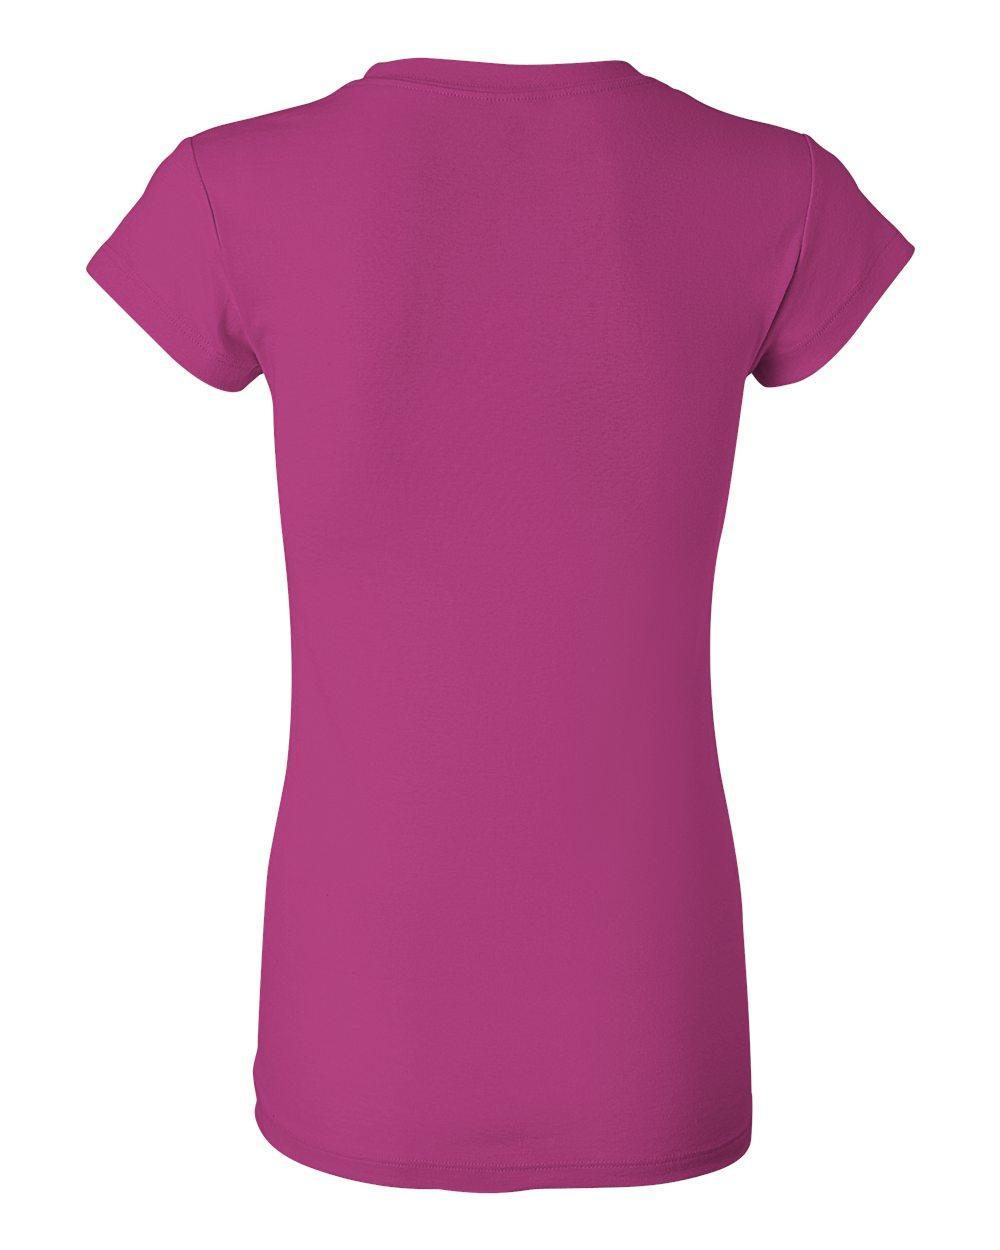 Bella-Canvas-Women-039-s-Sheer-Mini-Rib-Short-Sleeve-T-Shirt-8701-S-2XL thumbnail 16